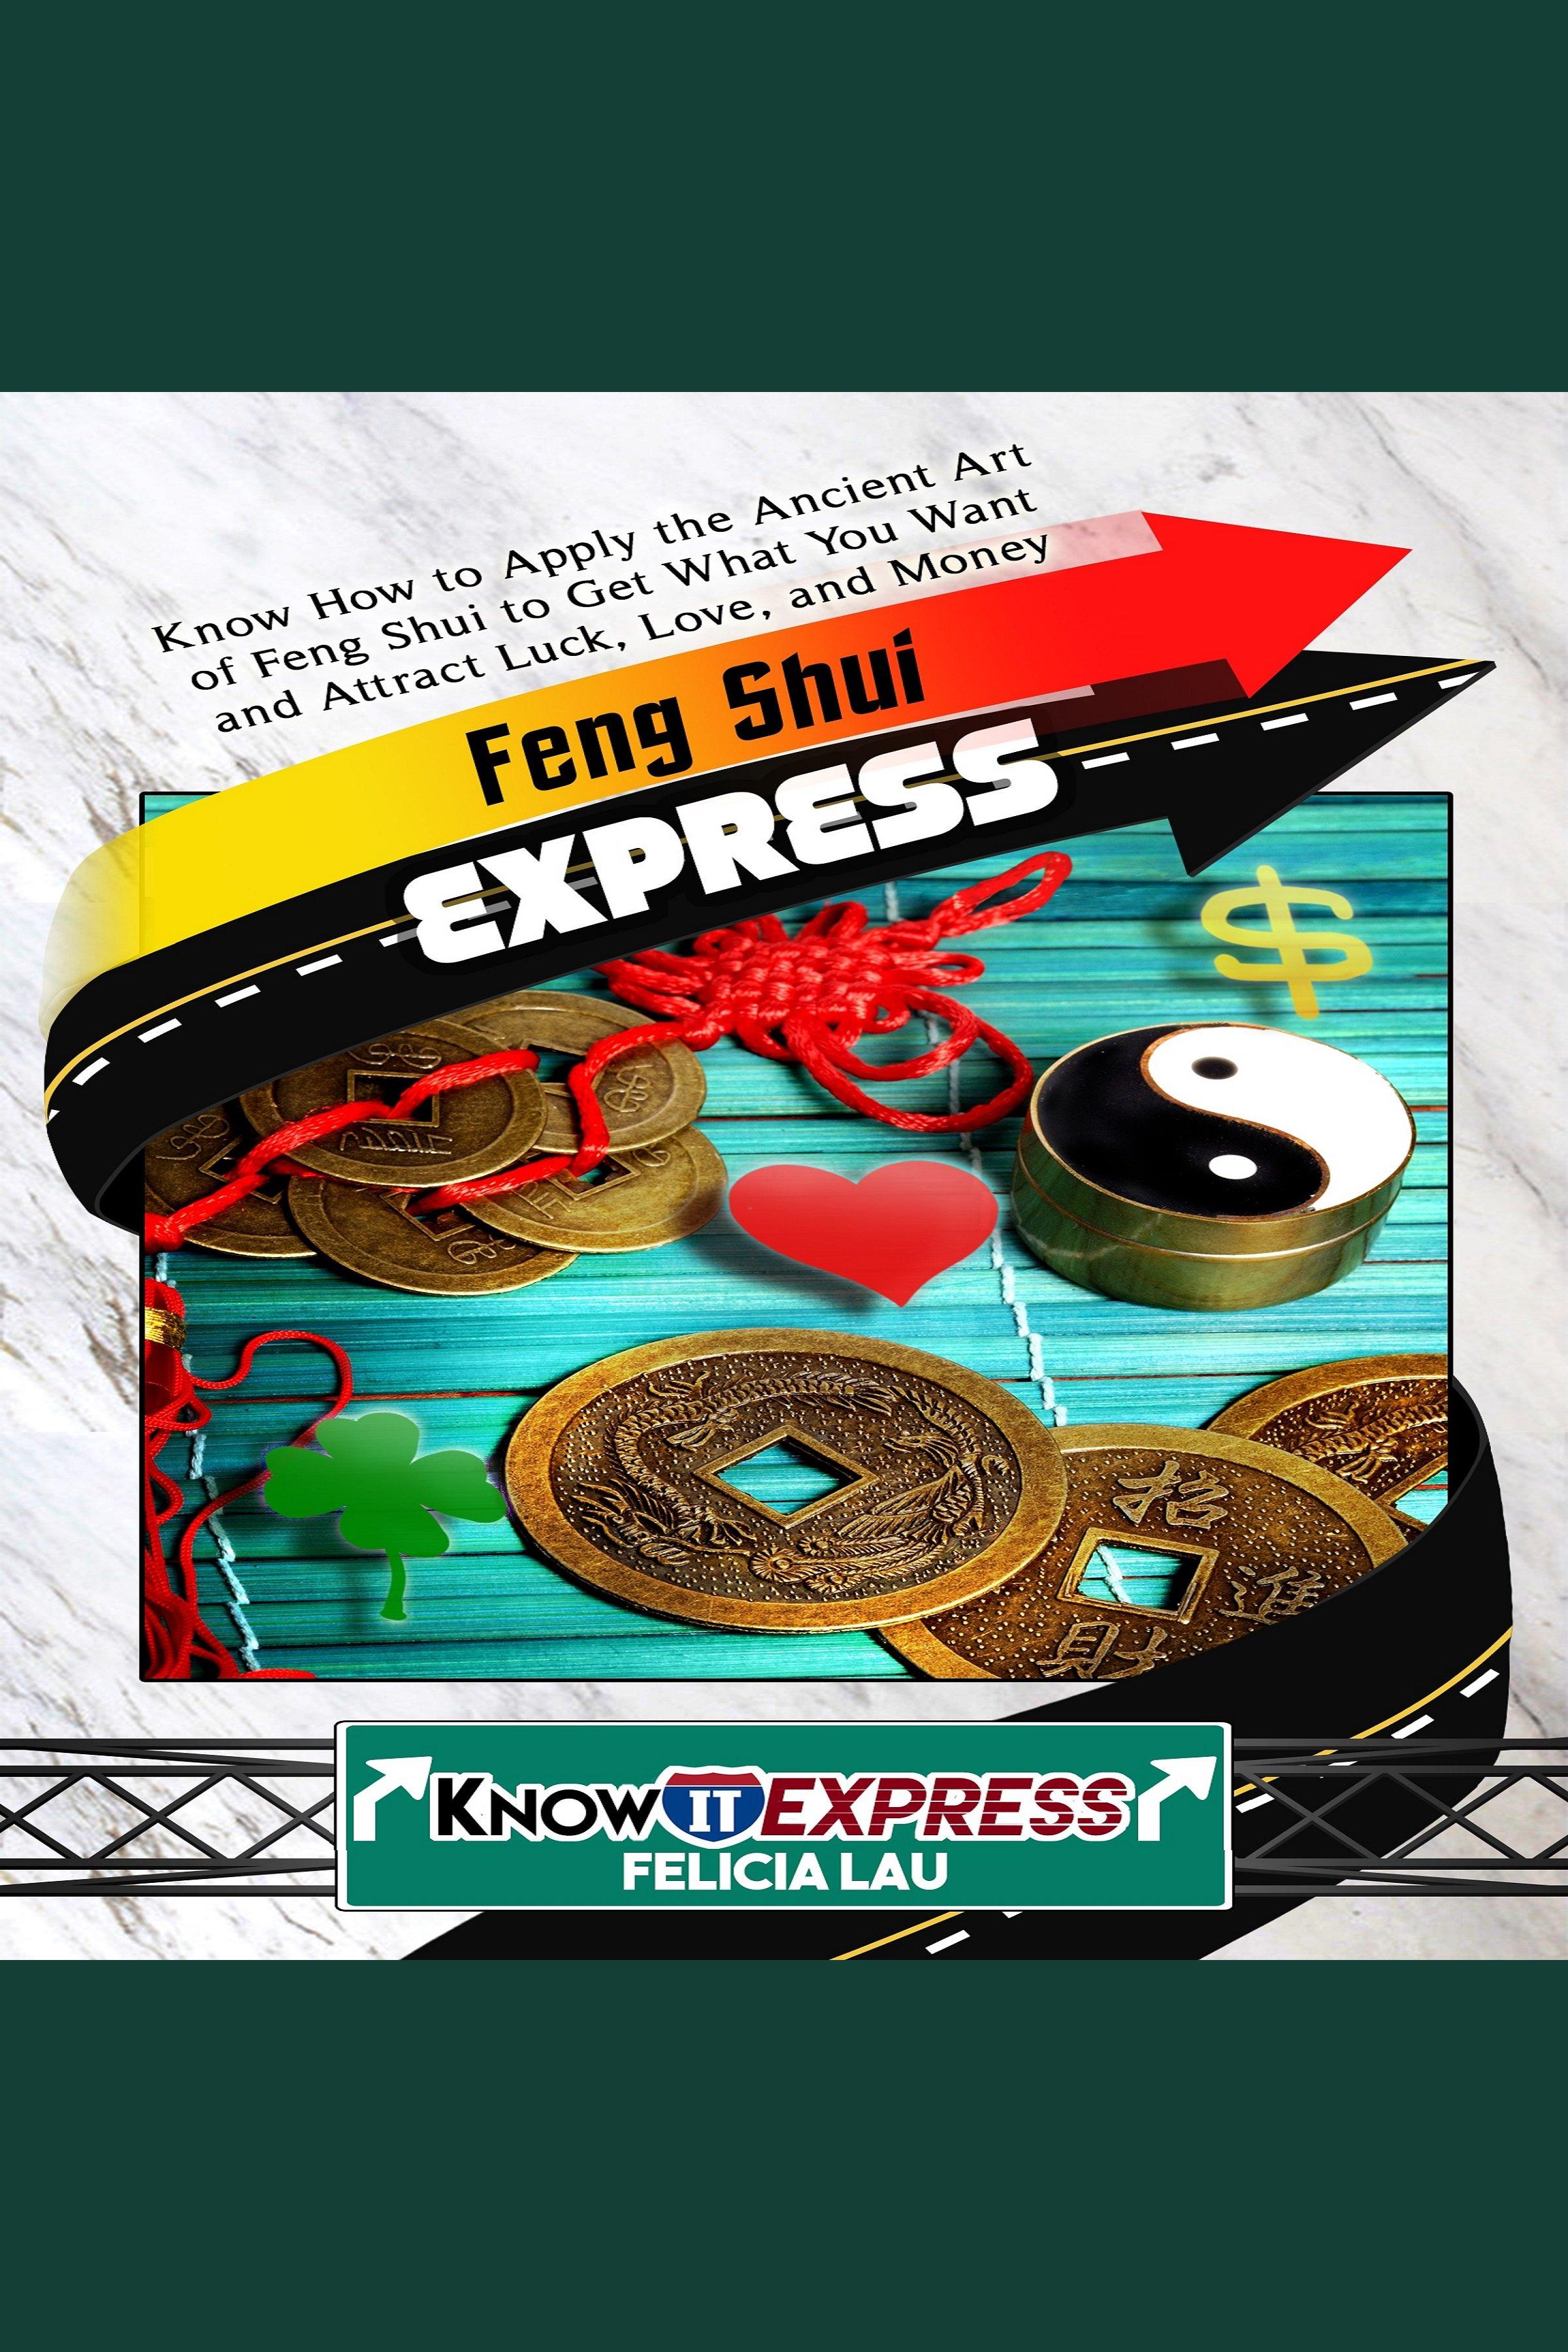 Esta es la portada del audiolibro Feng Shui Express